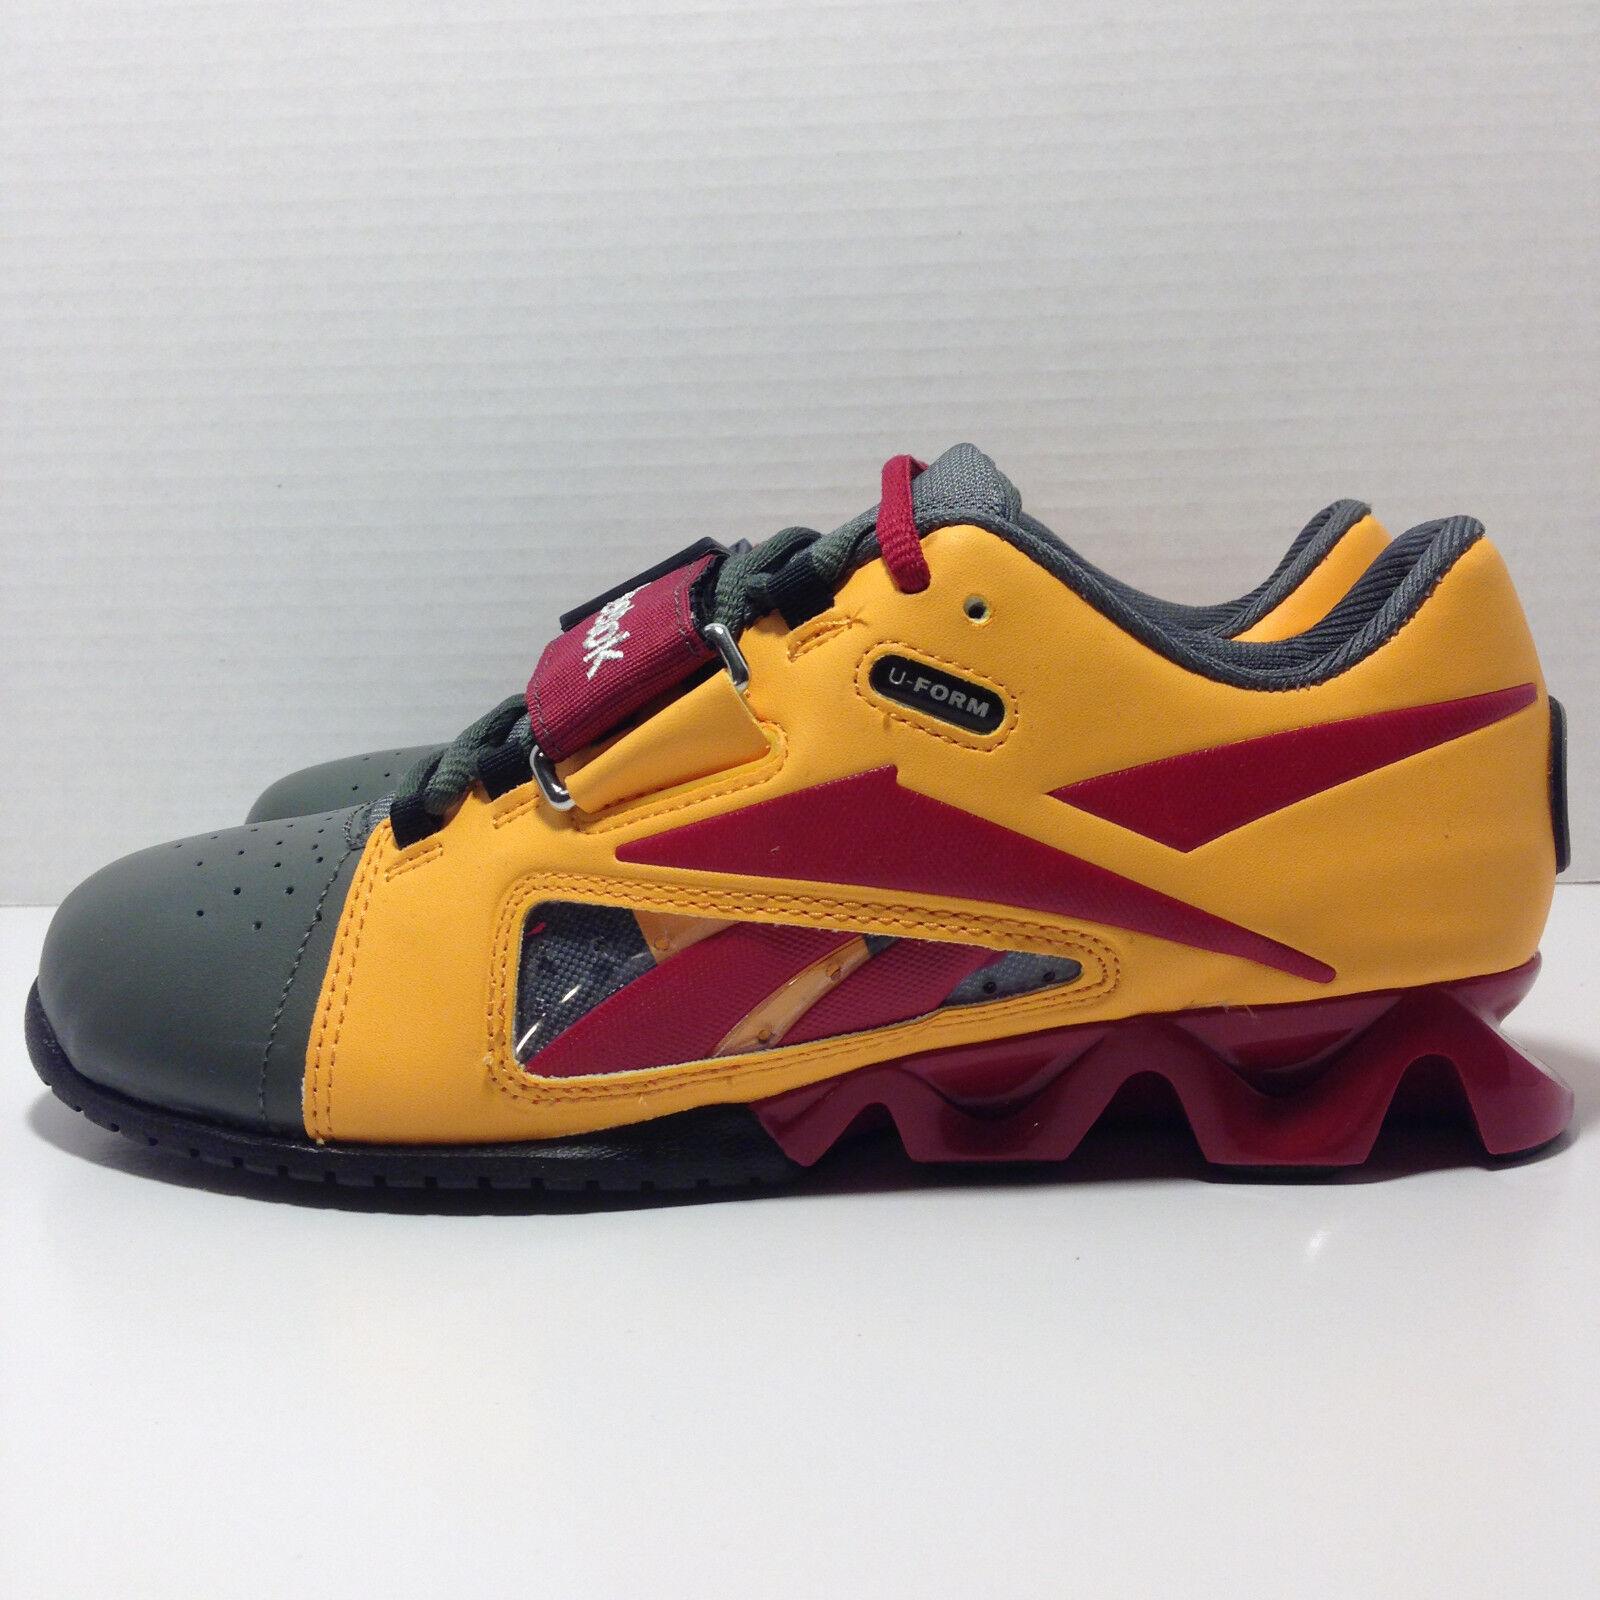 Reebok [V48457] Crossfit Oly U-shape Lifter Chaussures For femmes Size: 10